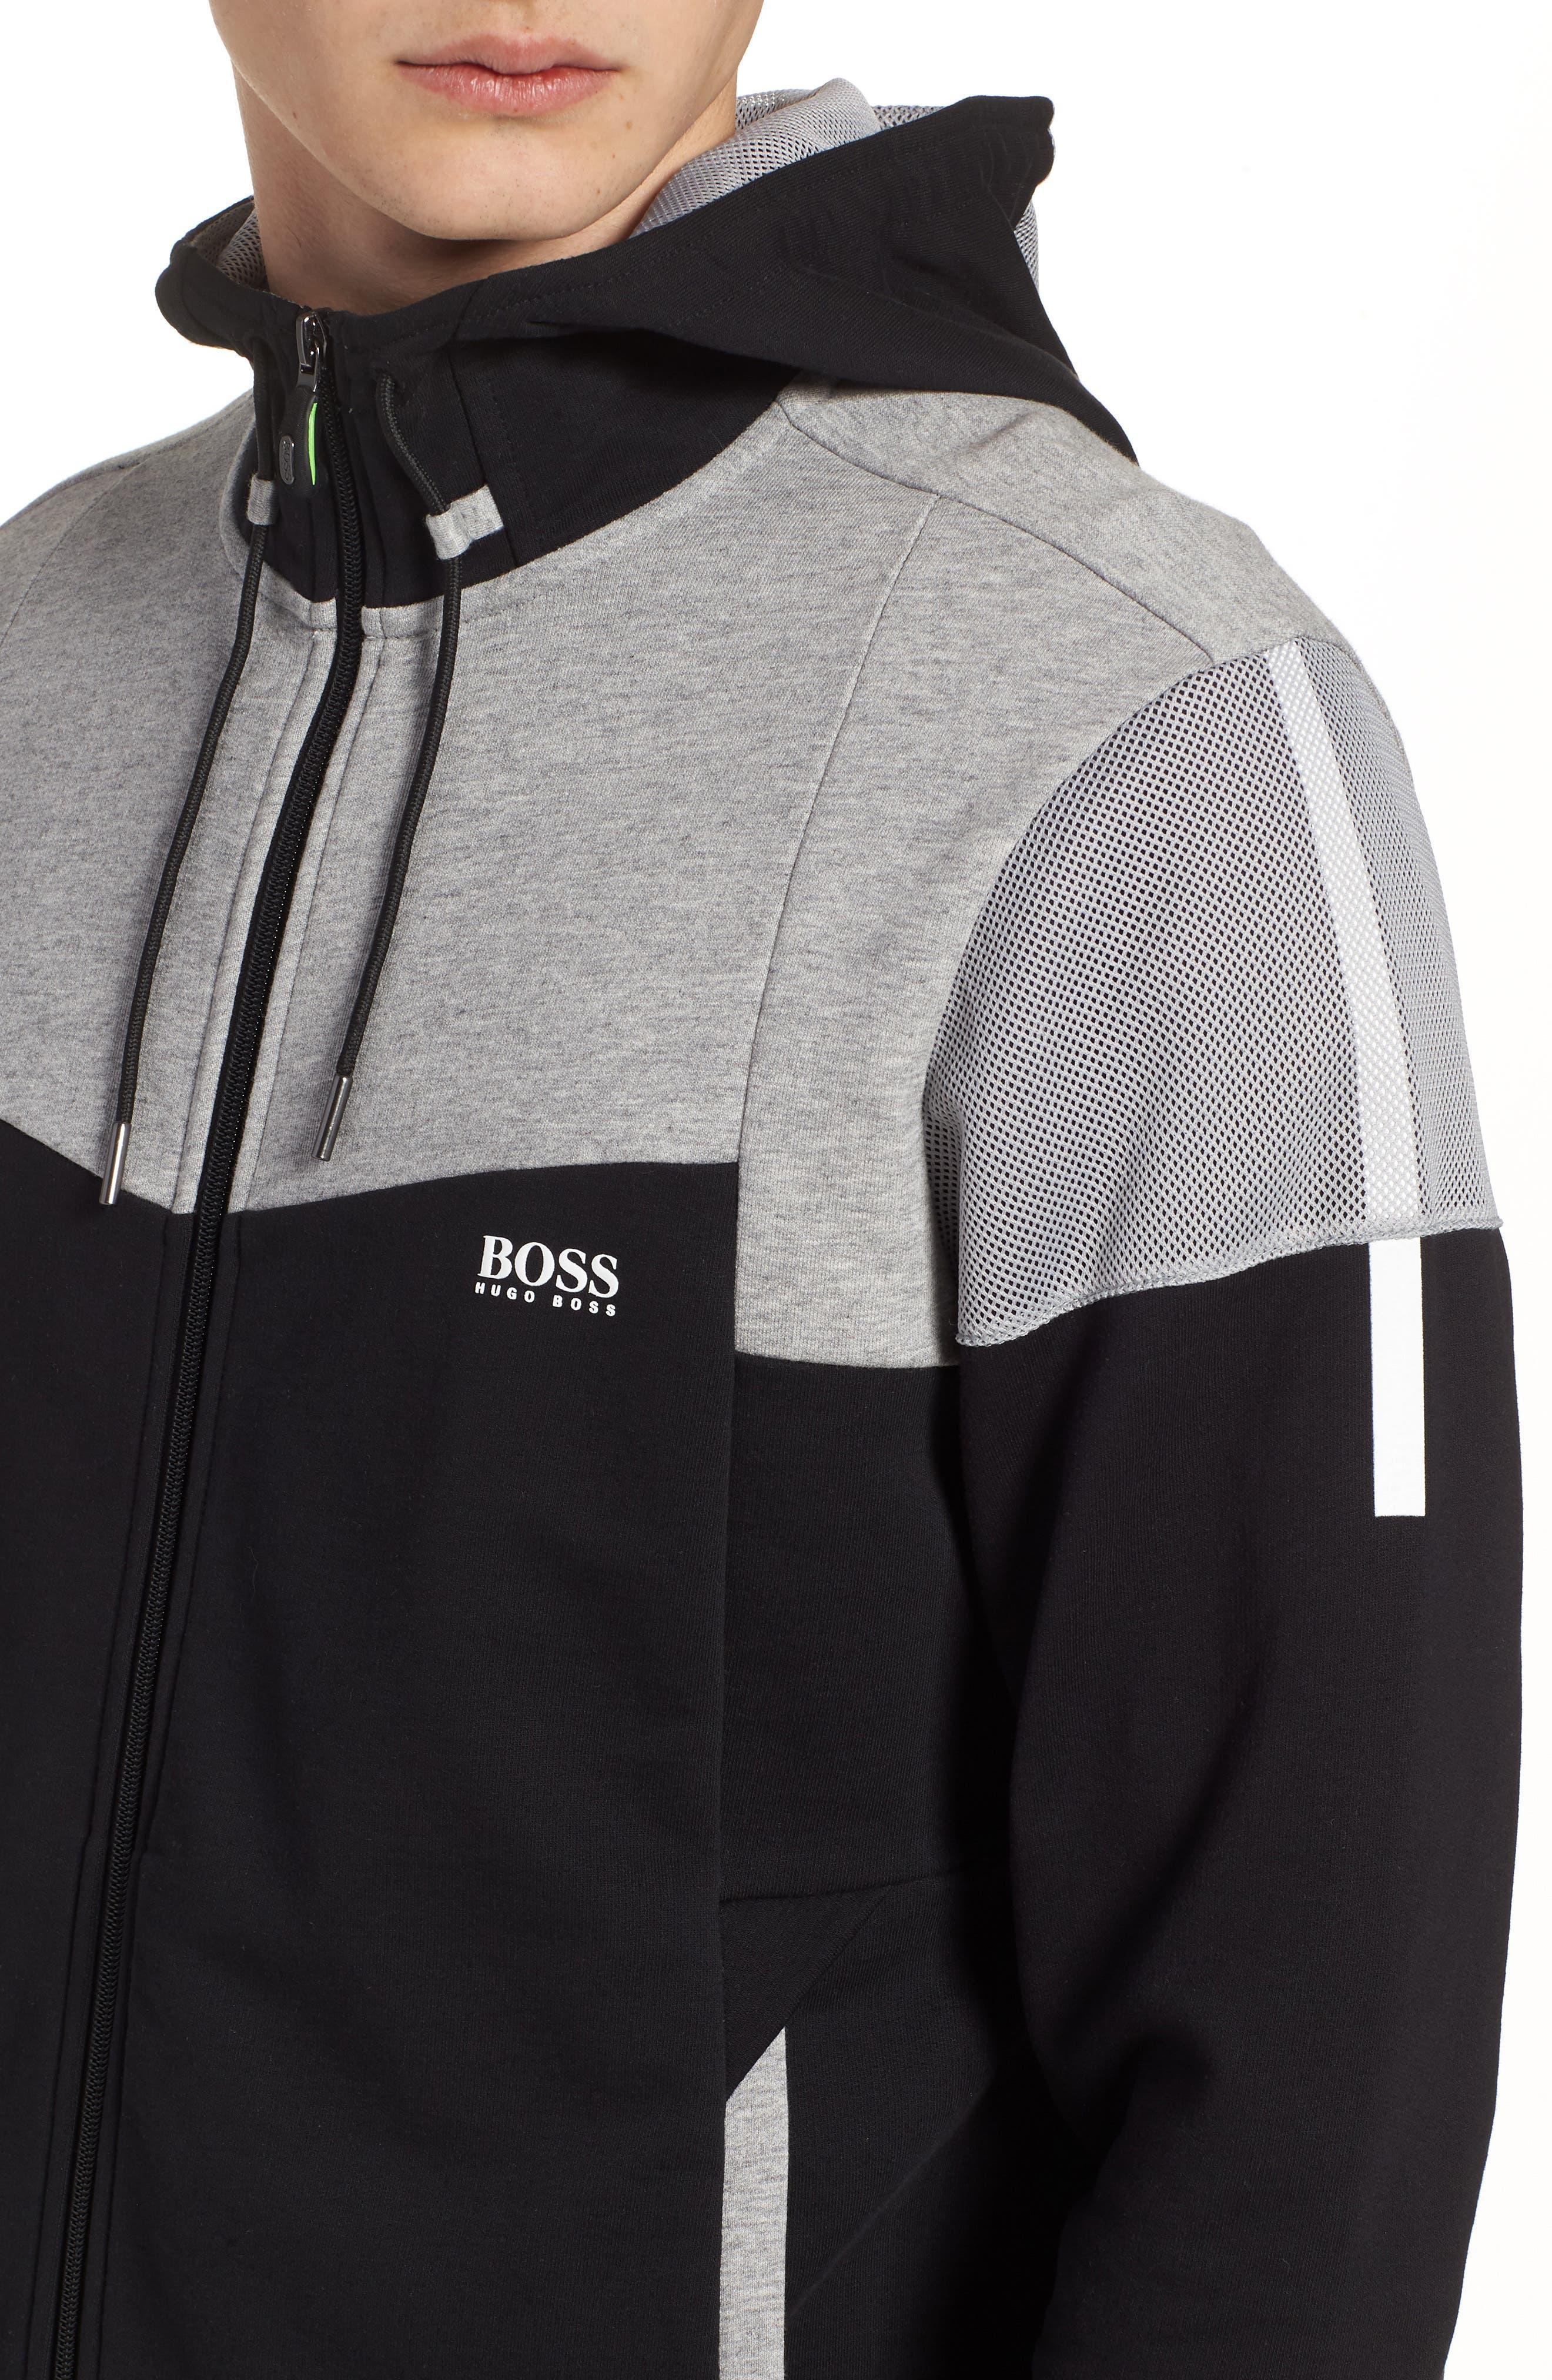 Regular Fit Hooded Fleece Jacket,                             Alternate thumbnail 4, color,                             Black